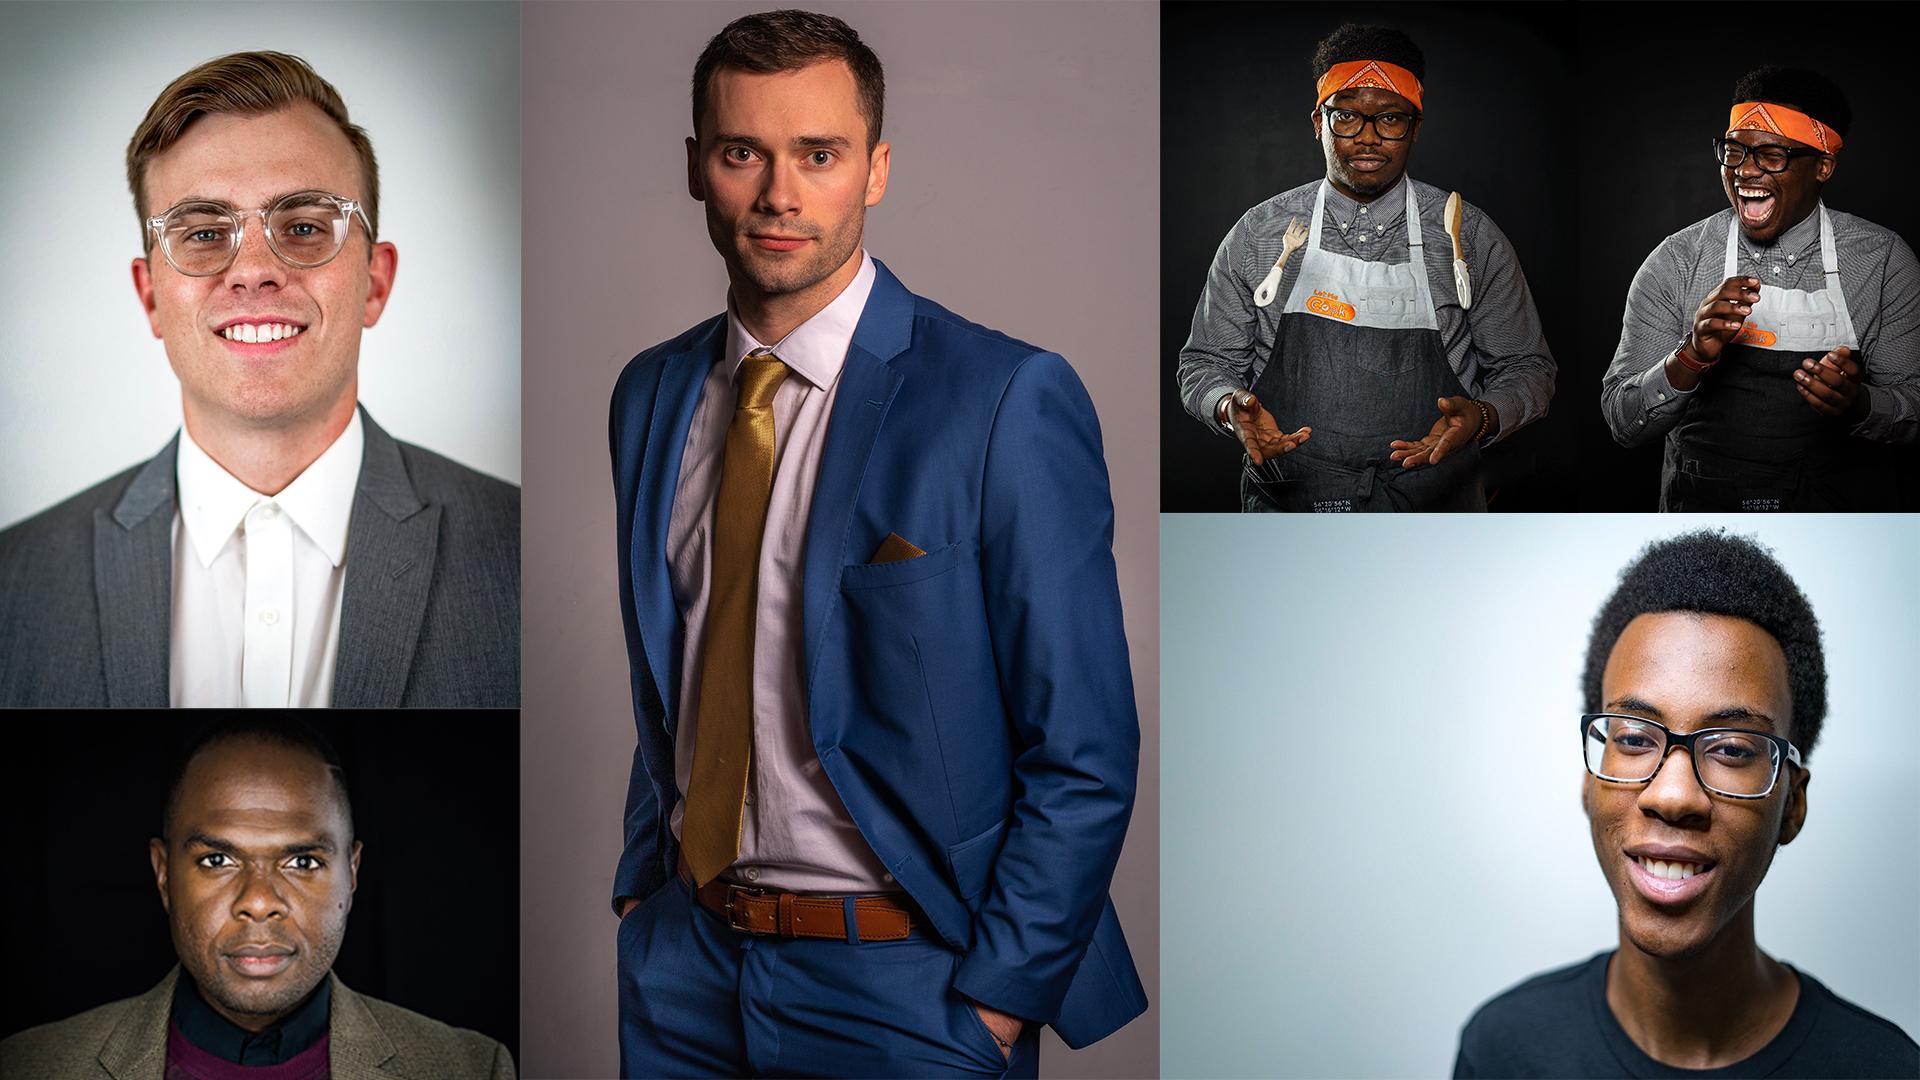 portraits + Headshots - INFORMATION ABOUT BOOKING PORTRAIT + HEADSHOT SESSIONS: